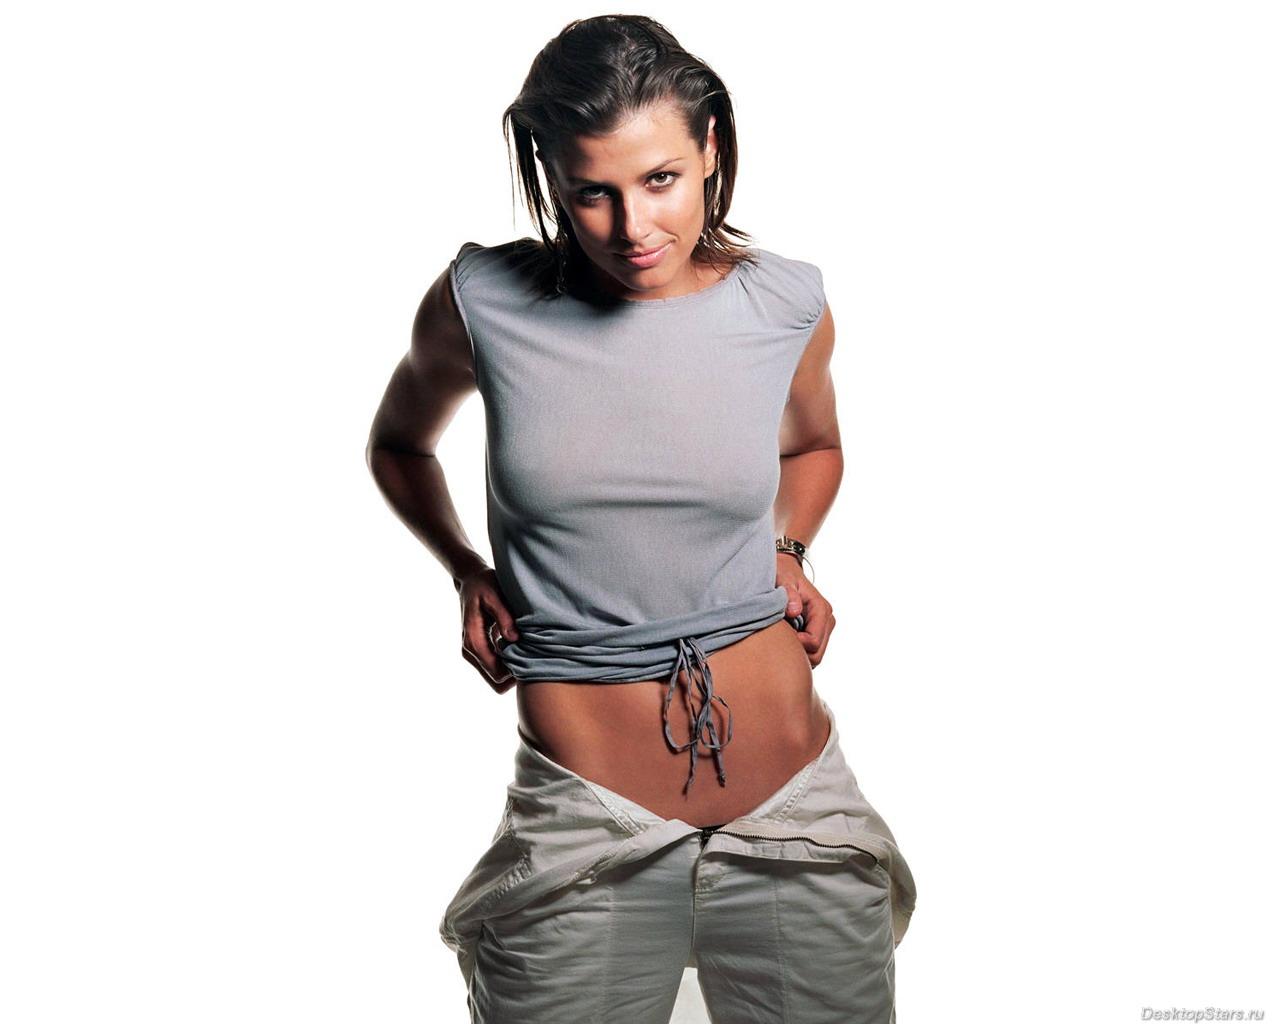 Бриджит Мойнахан фото раздевается Bridget Moynahan photo stripped